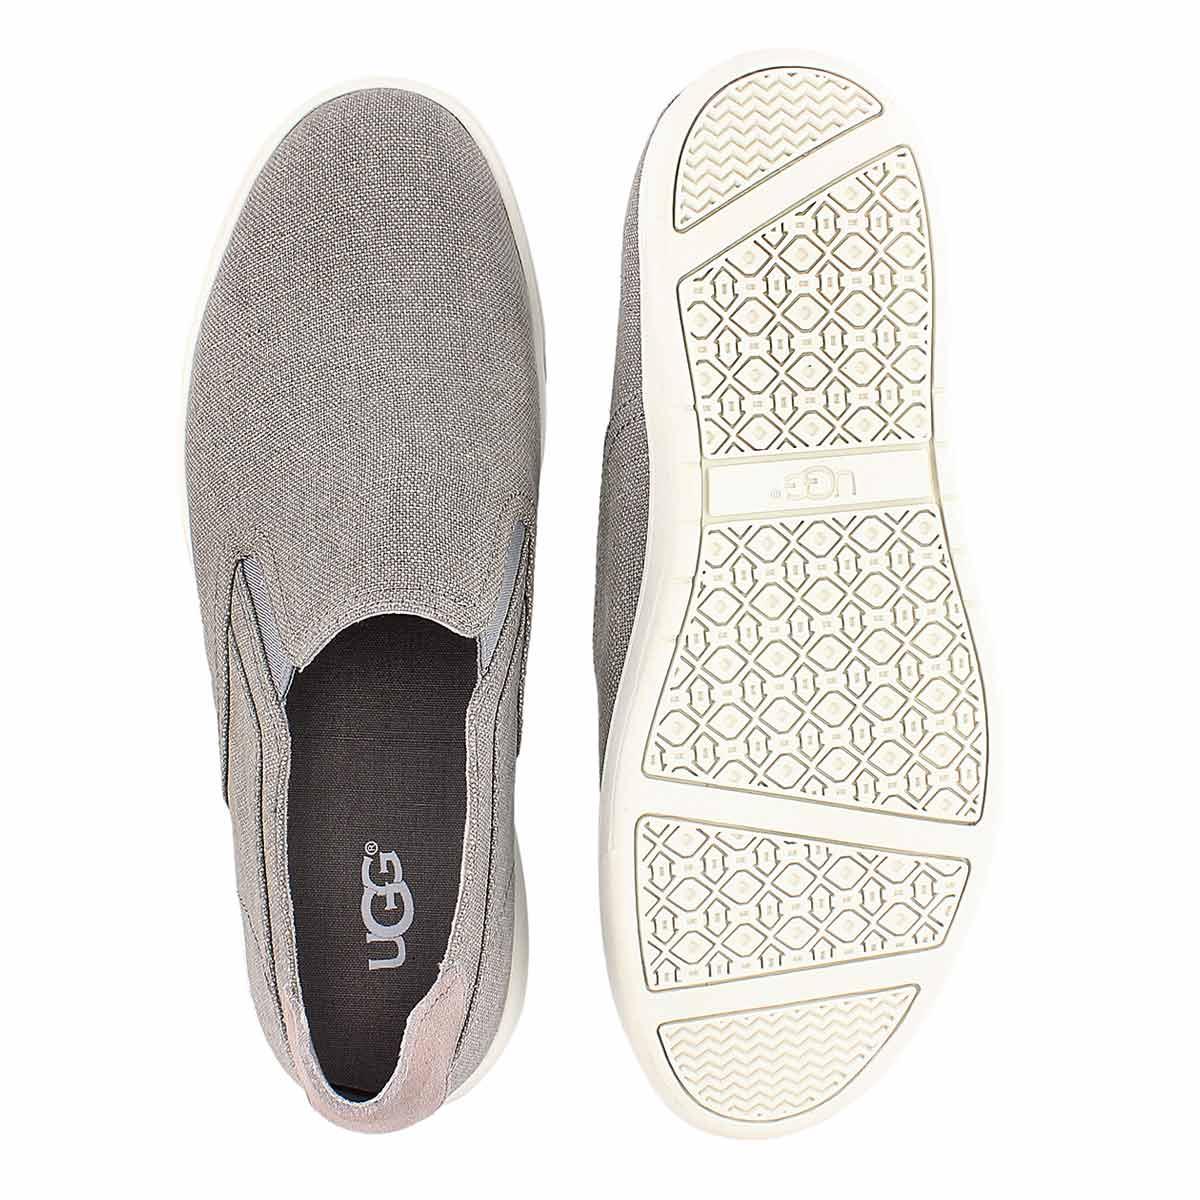 Mns Tobin Canvas seal slip on shoe